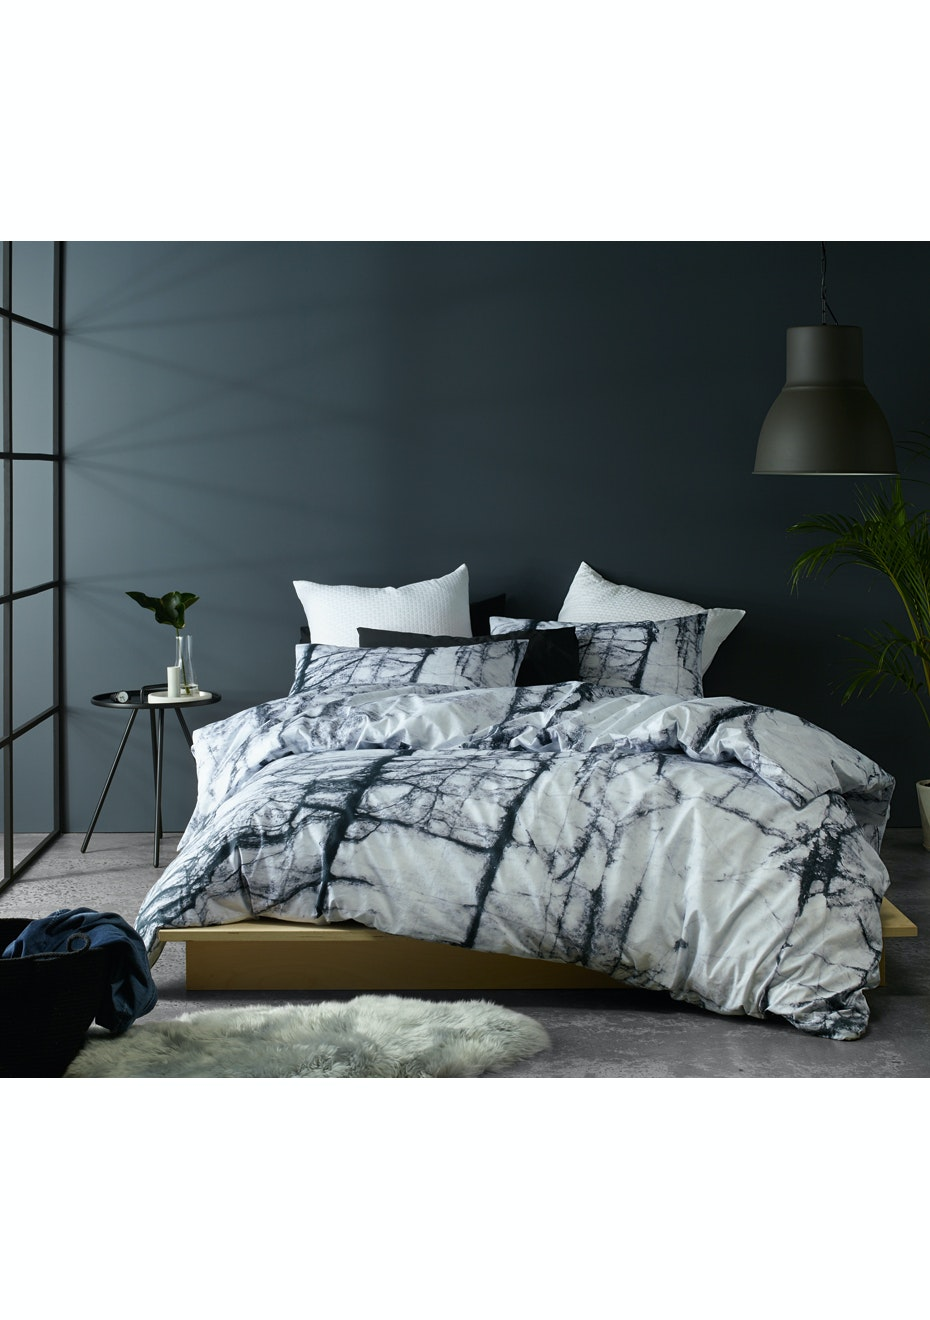 Calcutta Quilt Cover Set - Queen Bed